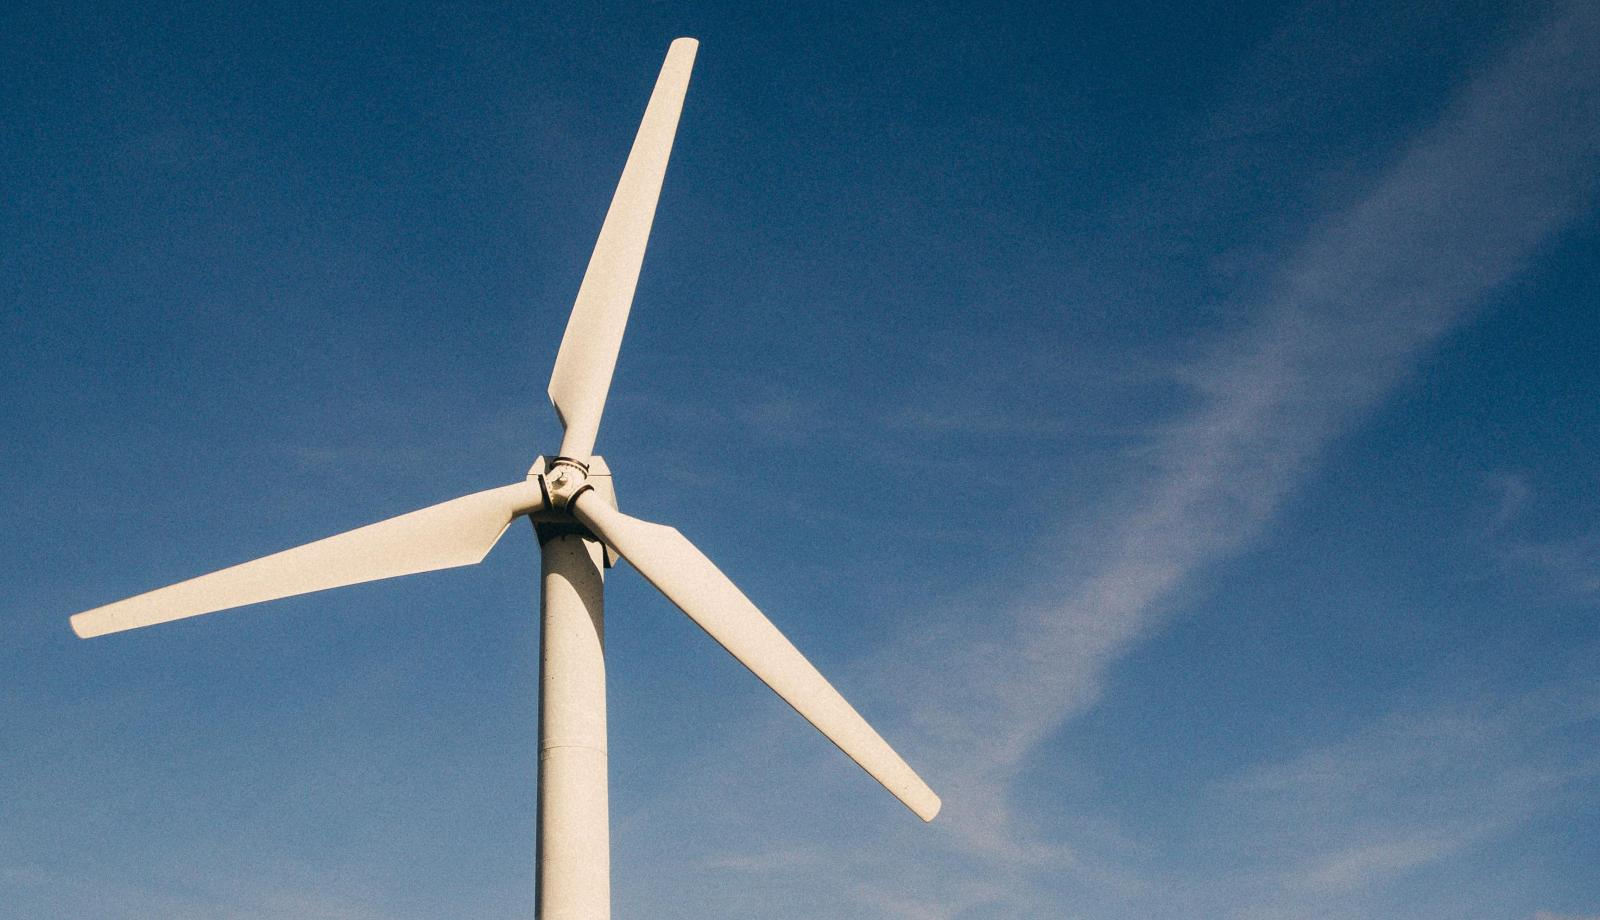 Offshore wind farm proposal